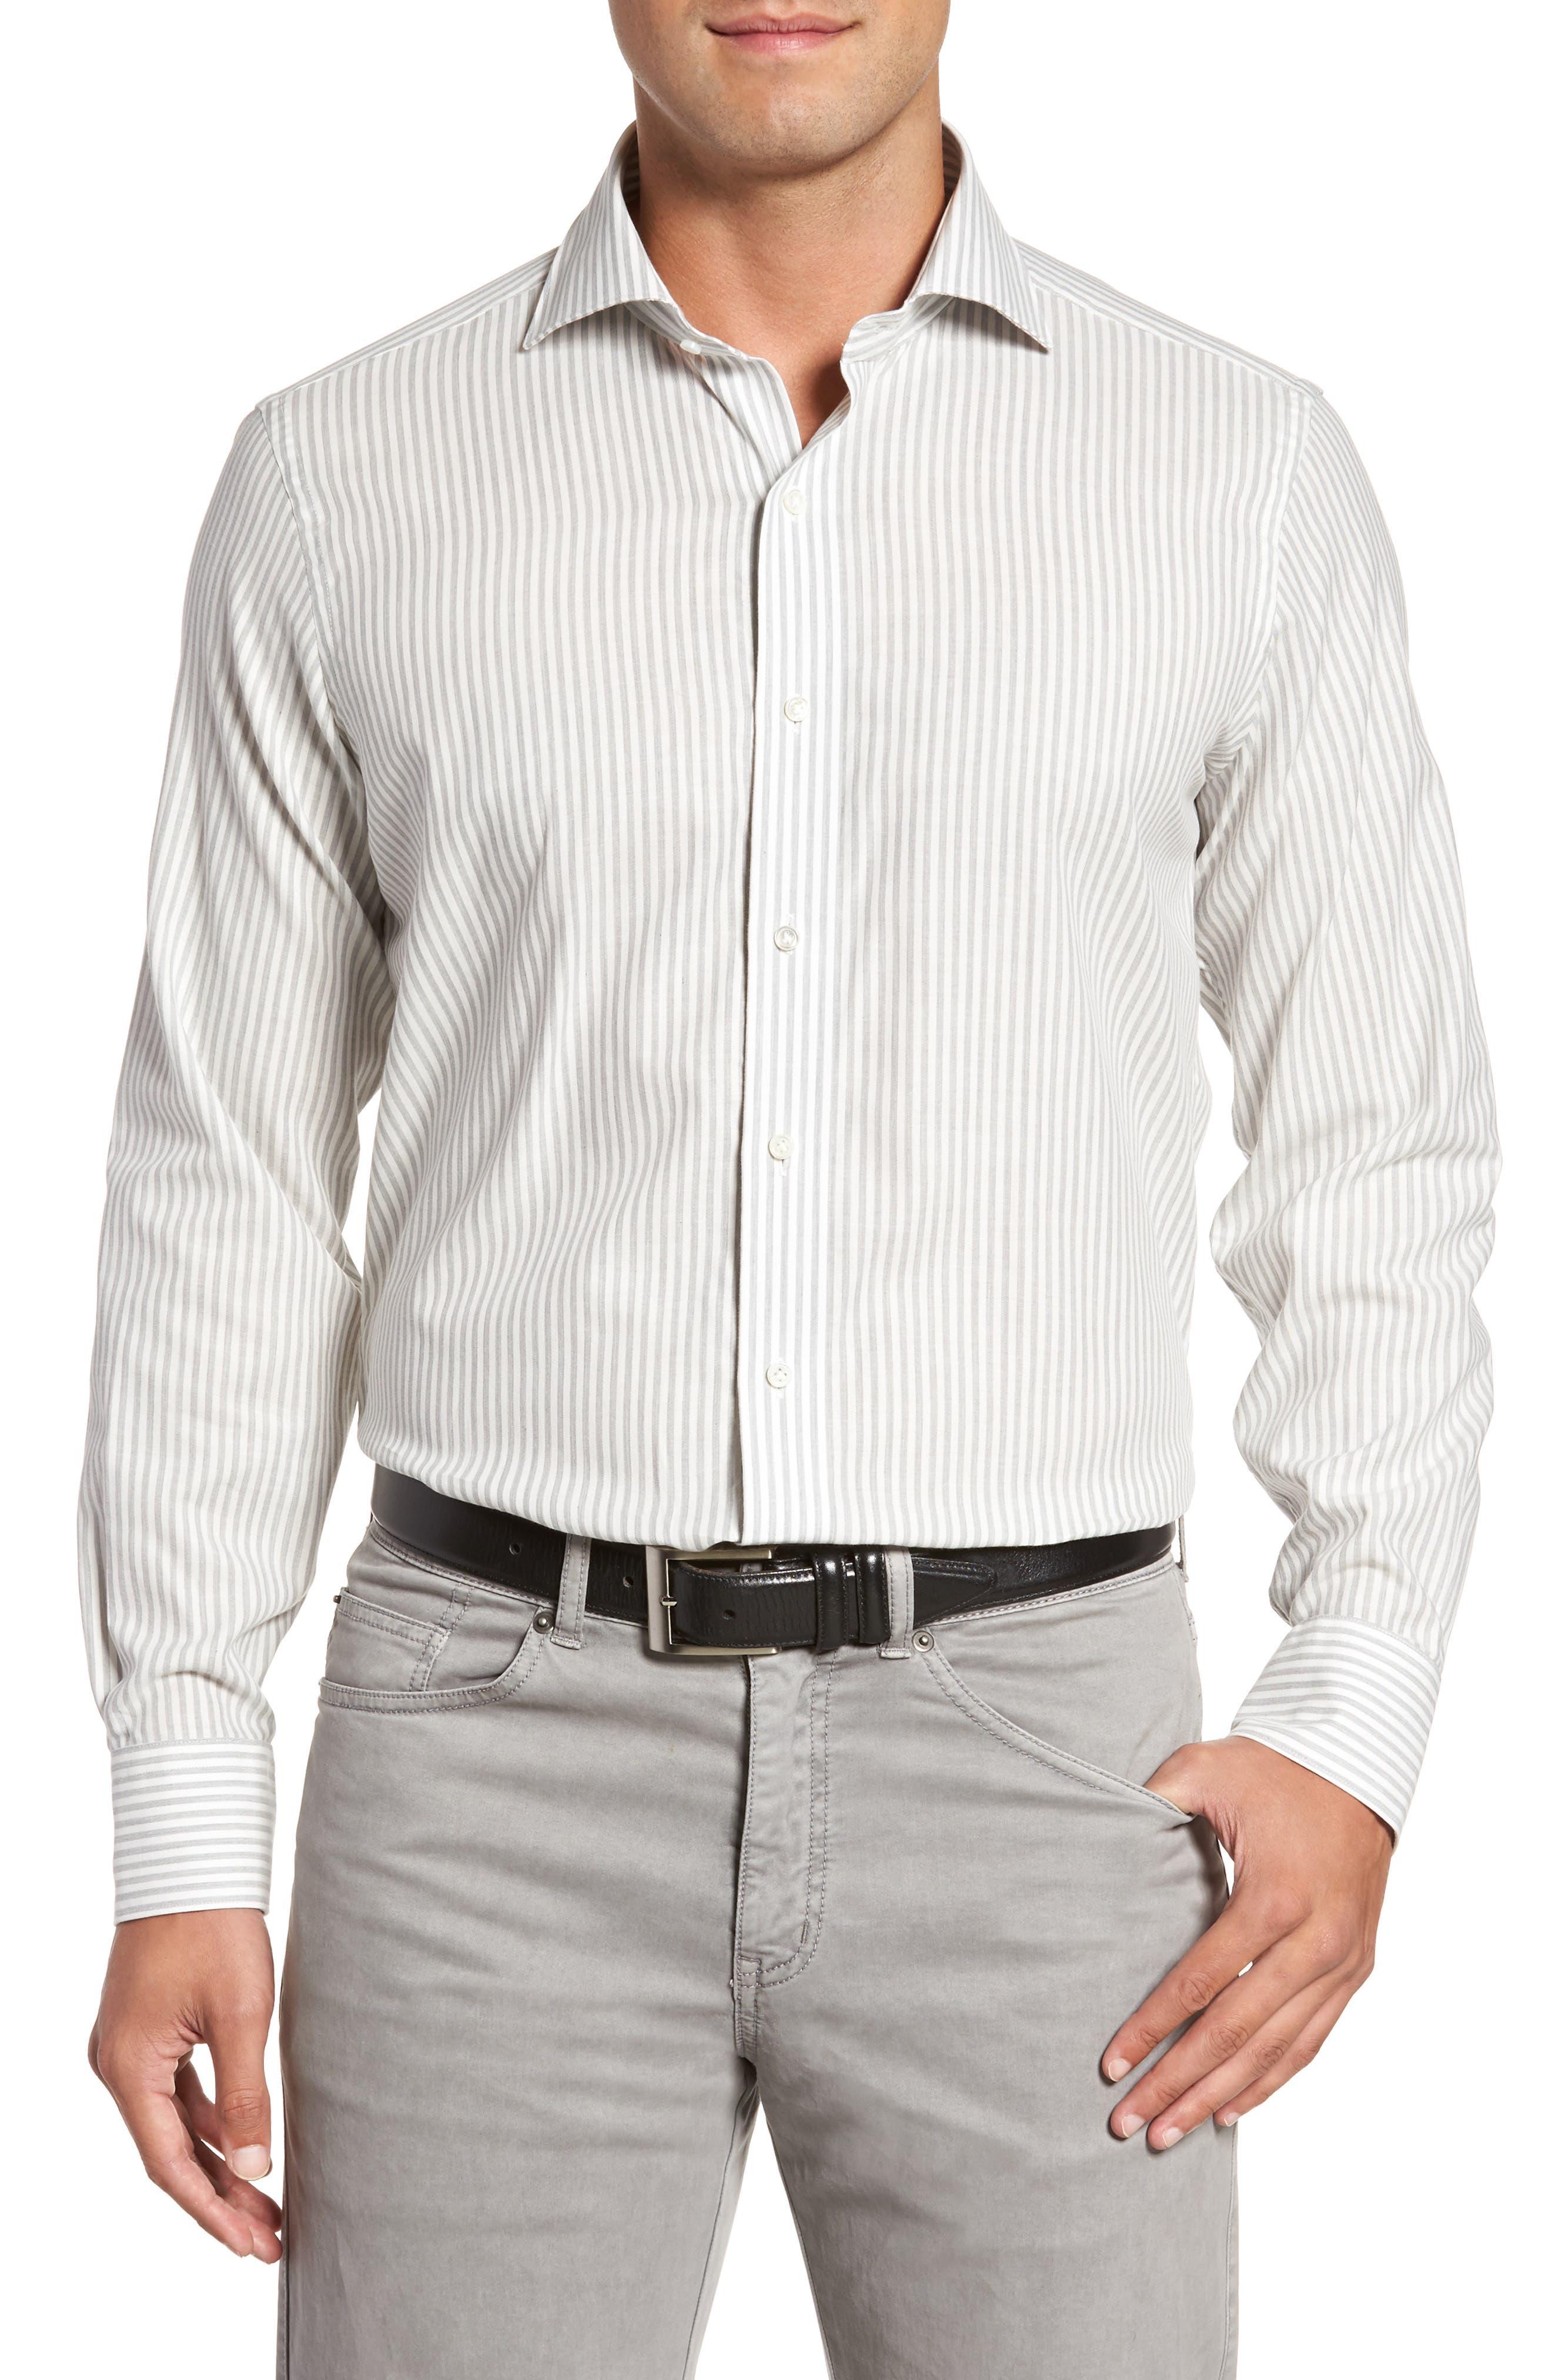 Main Image - Peter Millar Loch Mélange Stripe Sport Shirt